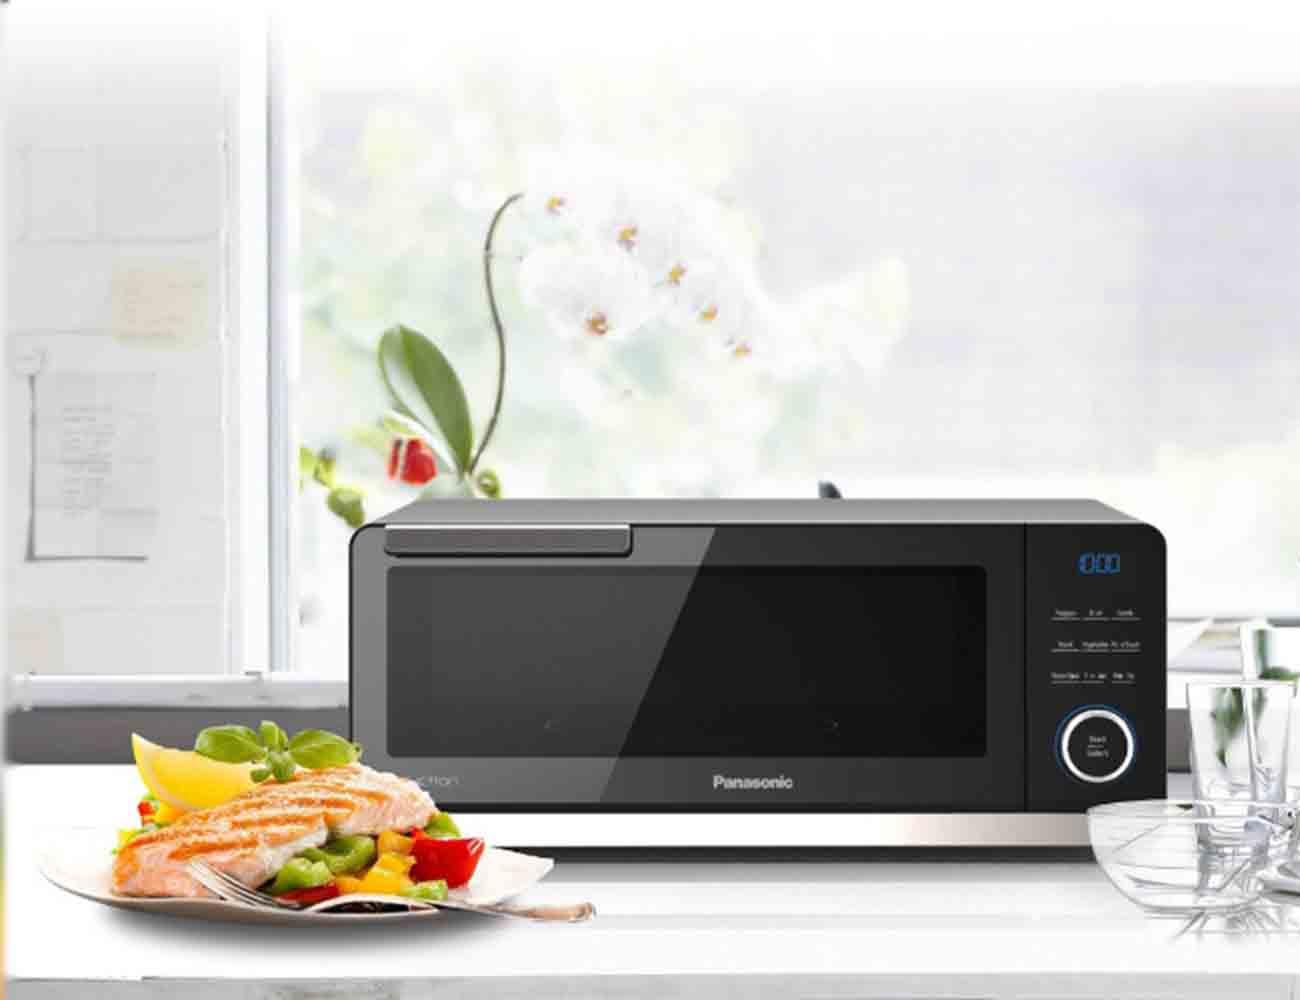 Panasonic+Countertop+Induction+Oven